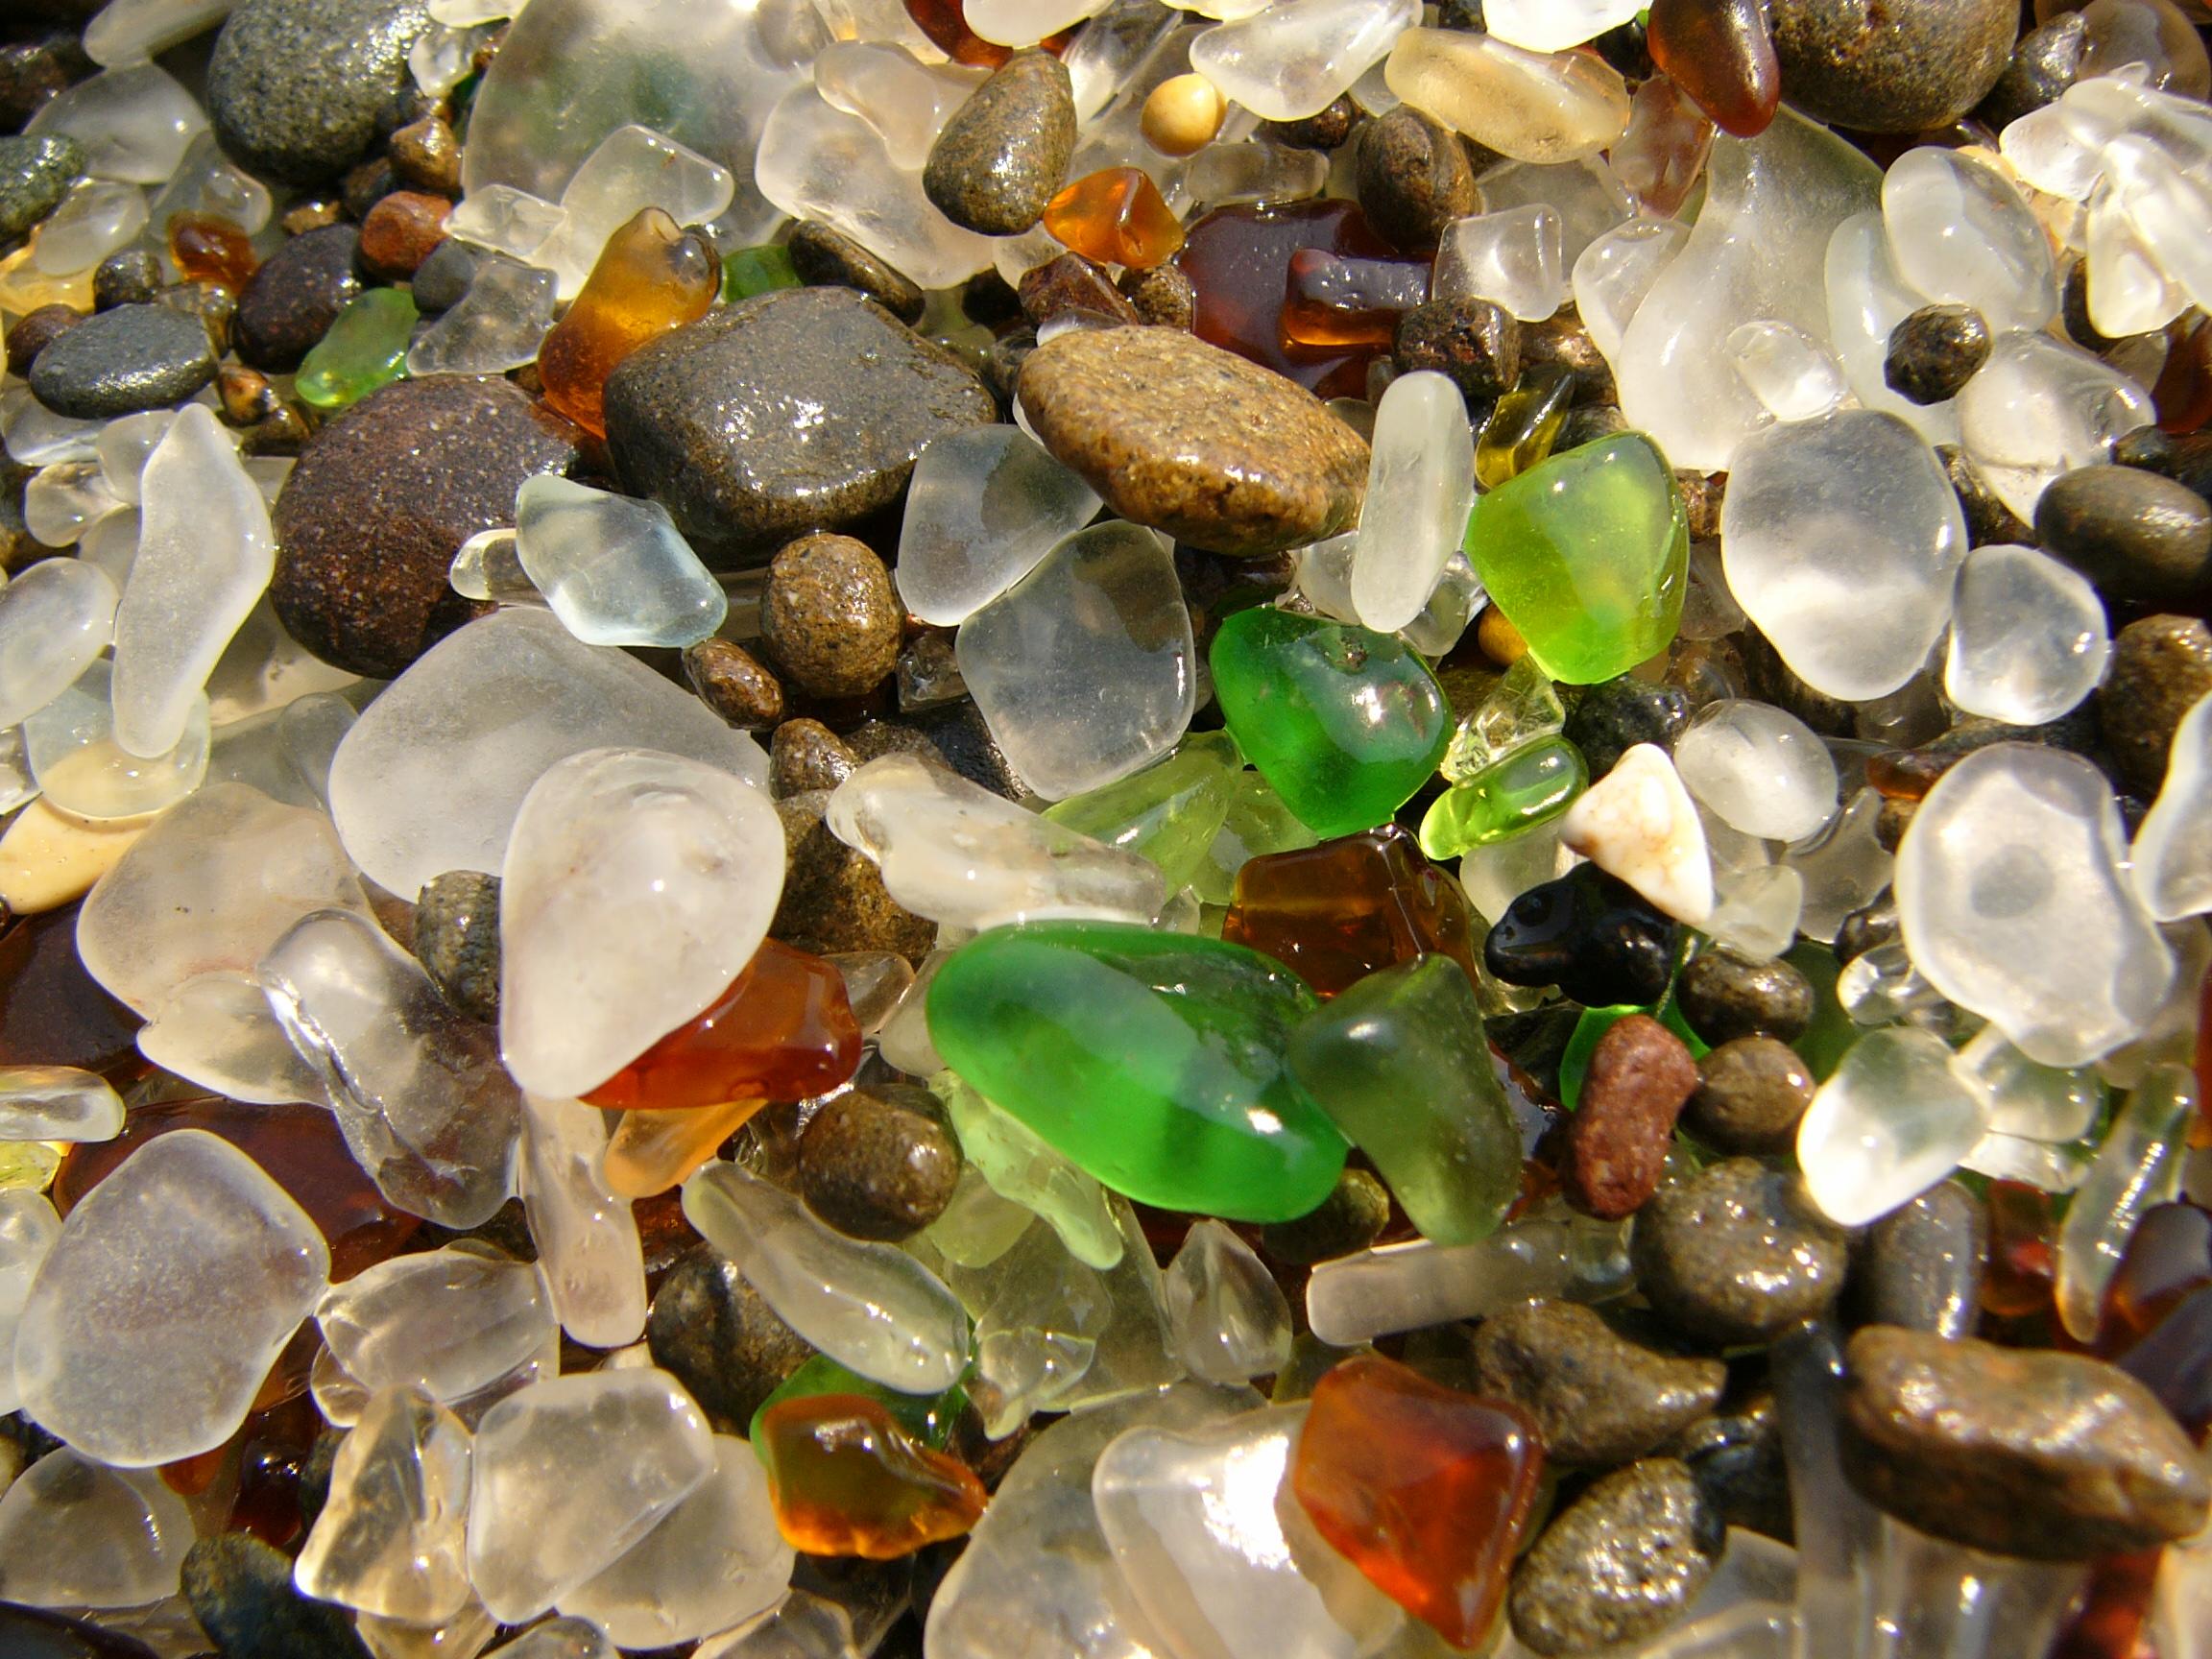 Glass Beach by Jeff Poskanzer